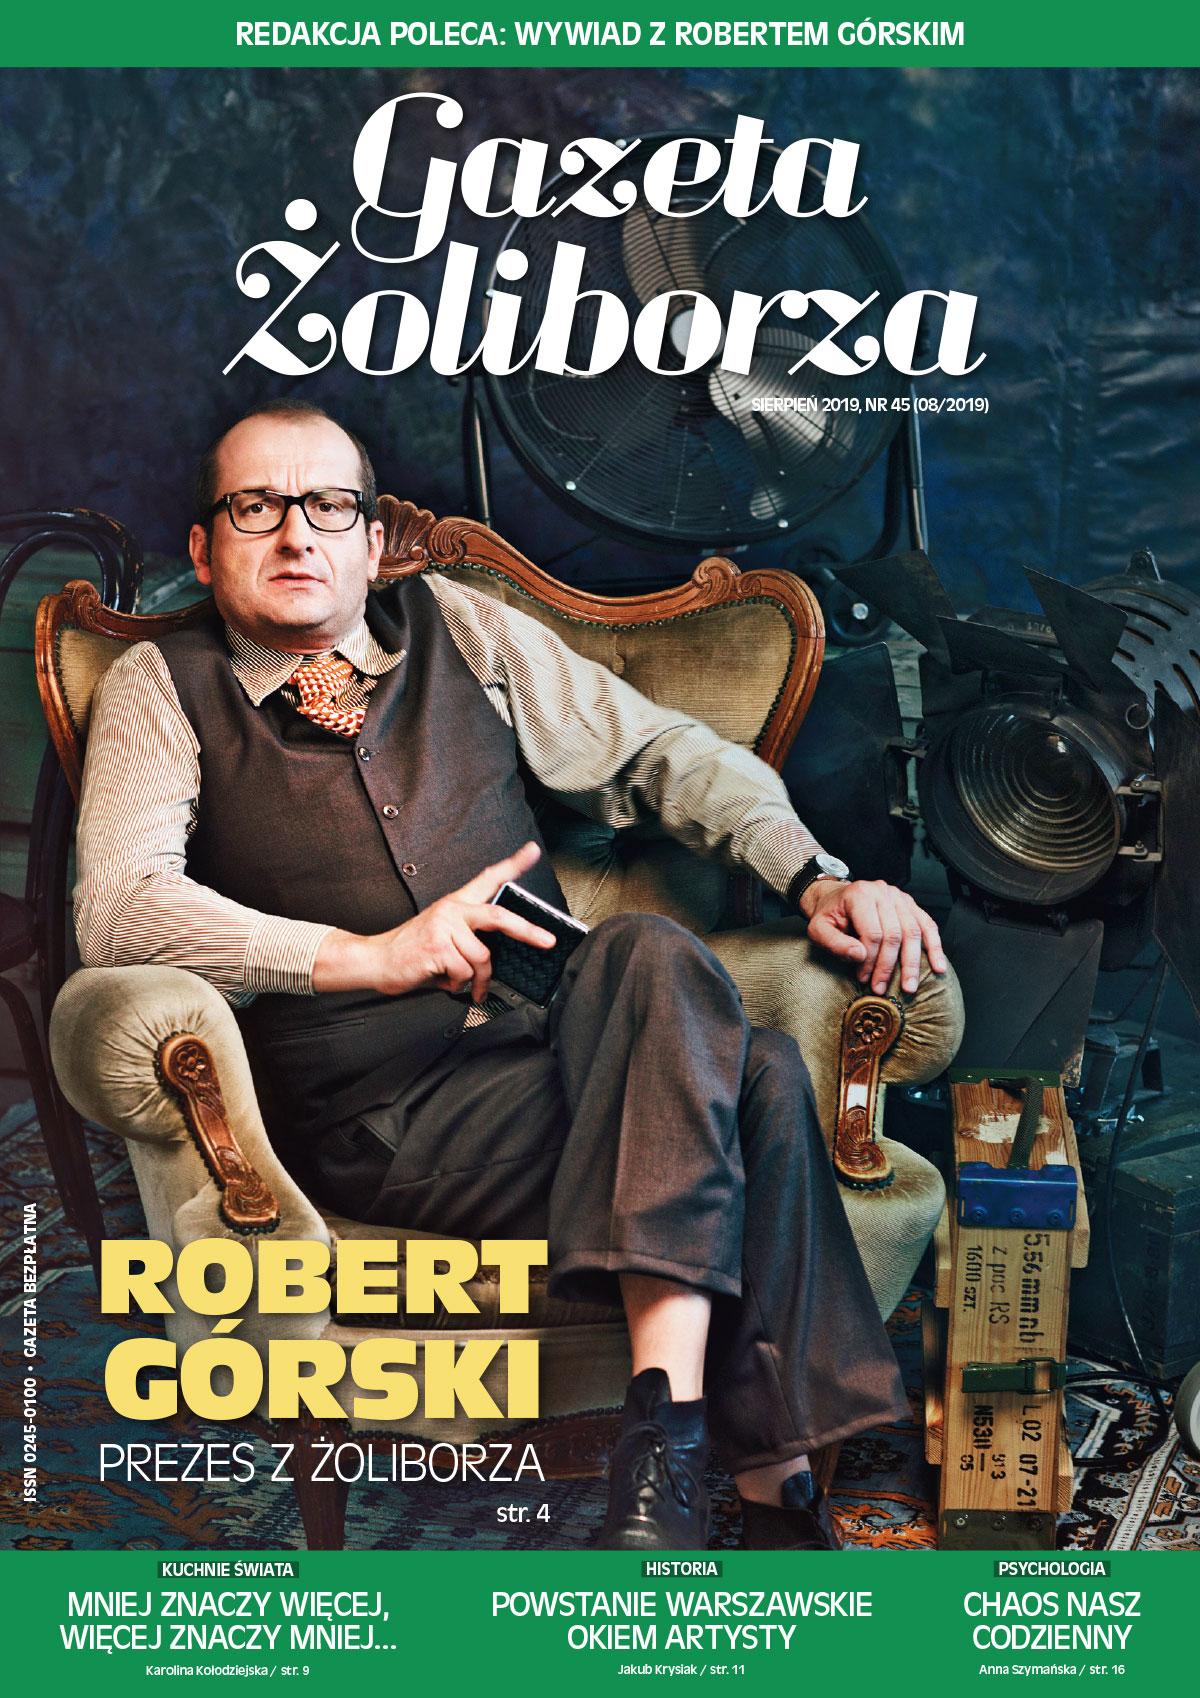 Gazeta Żoliborza - 08/2019 (45)